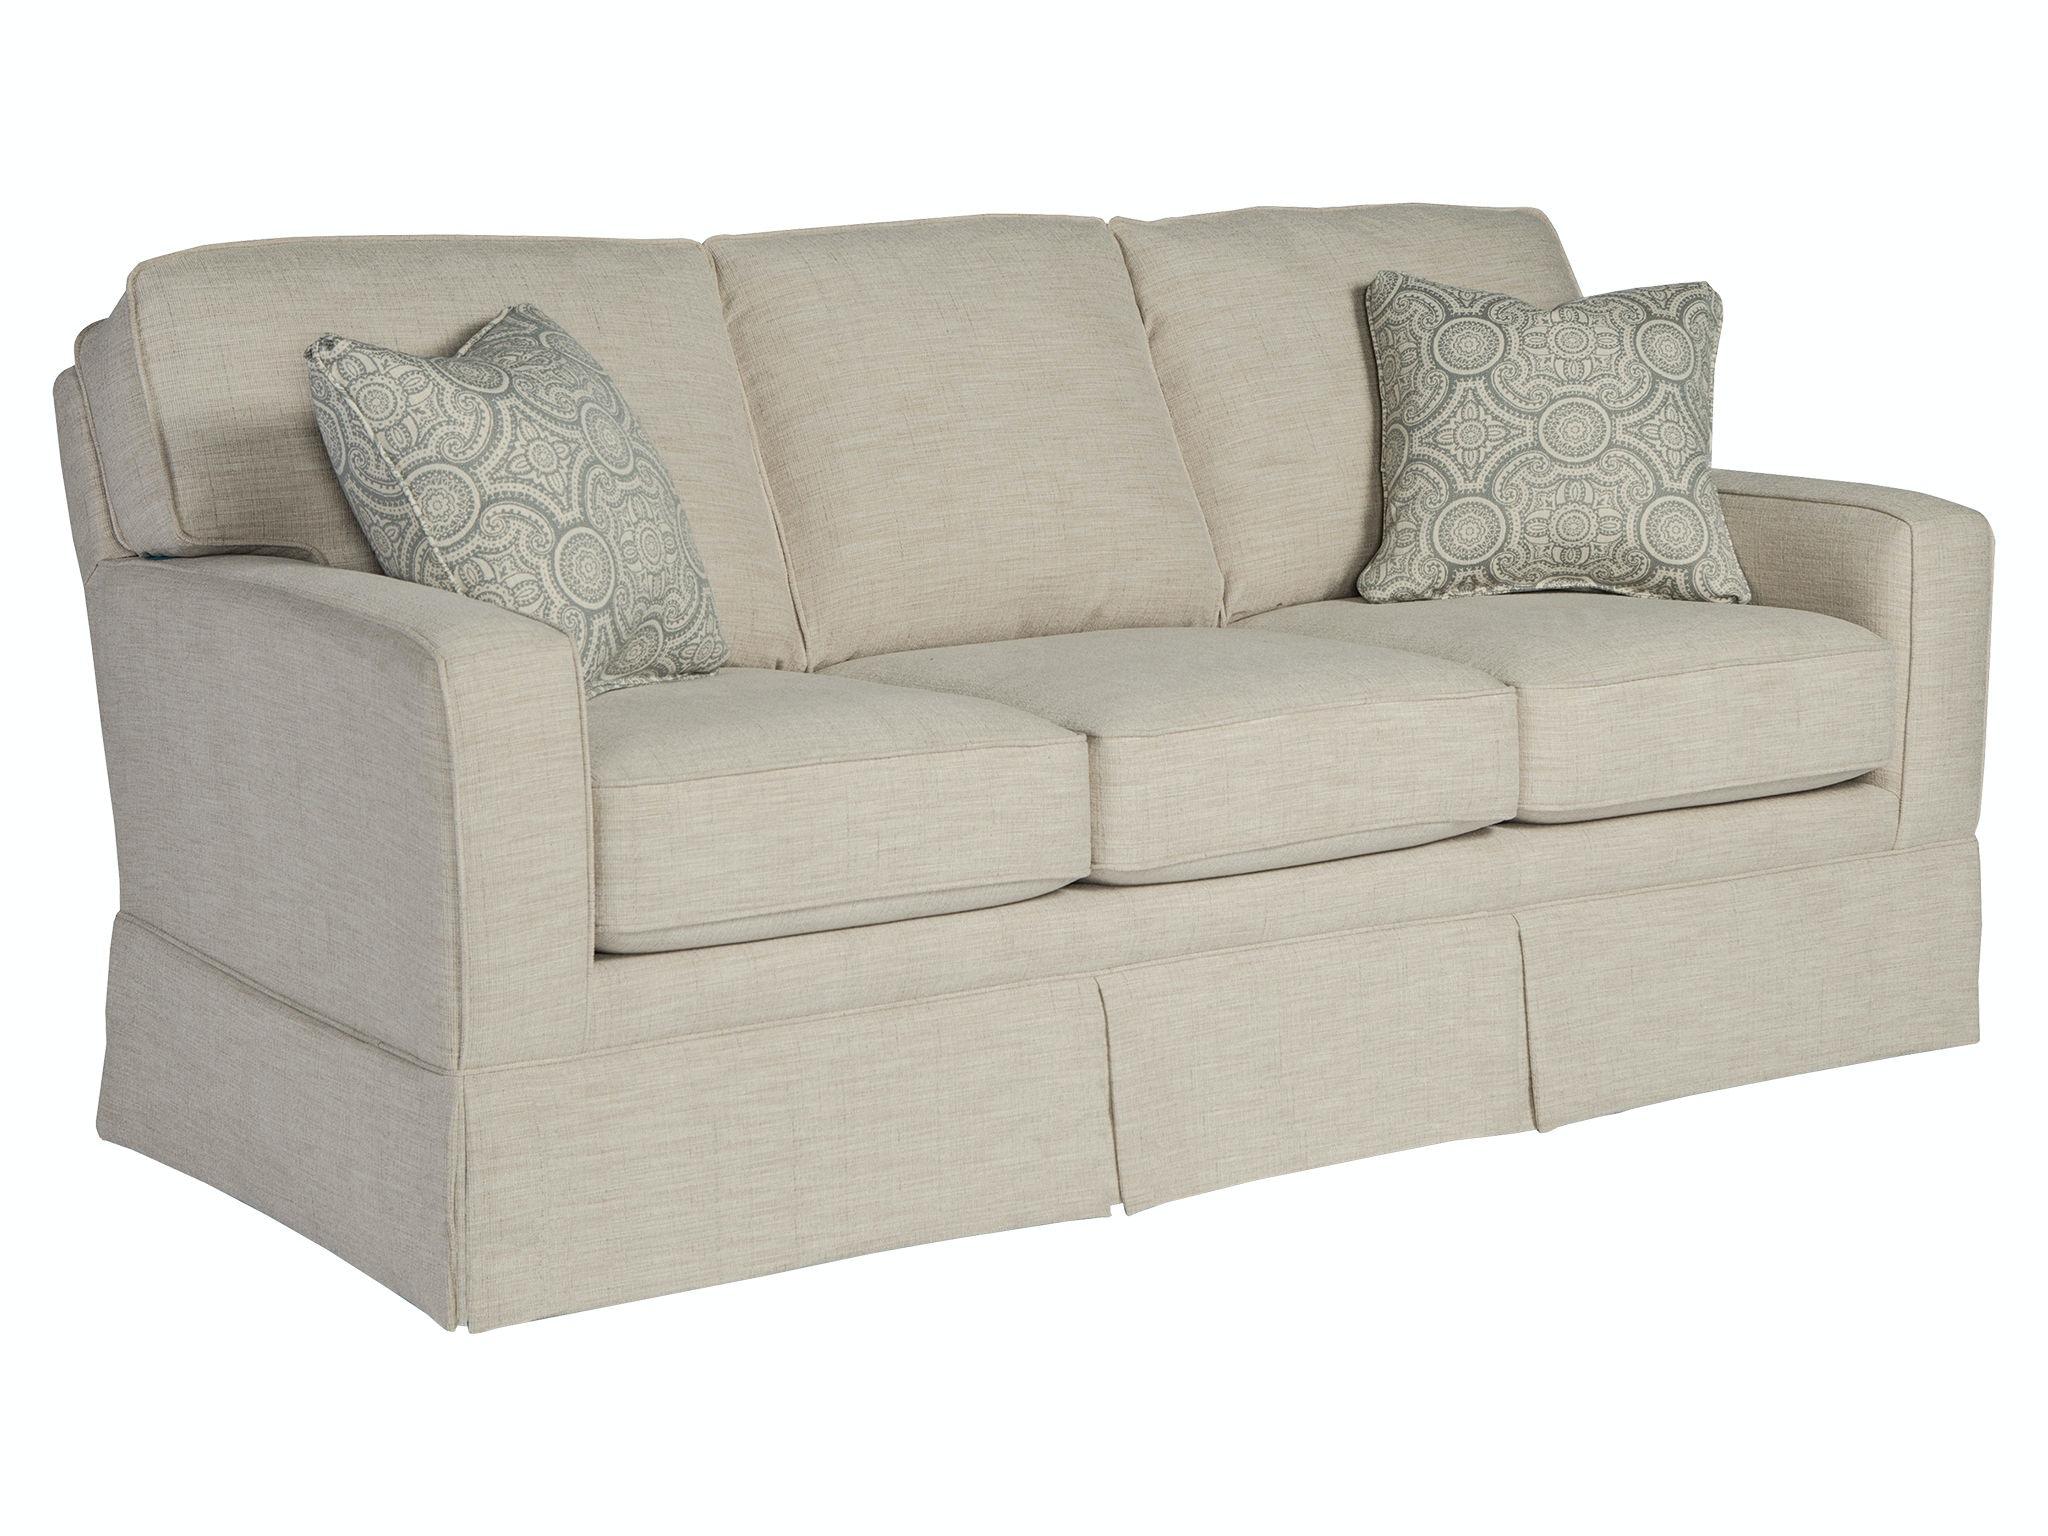 Best Home Furnishings Living Room Stationary Sofa